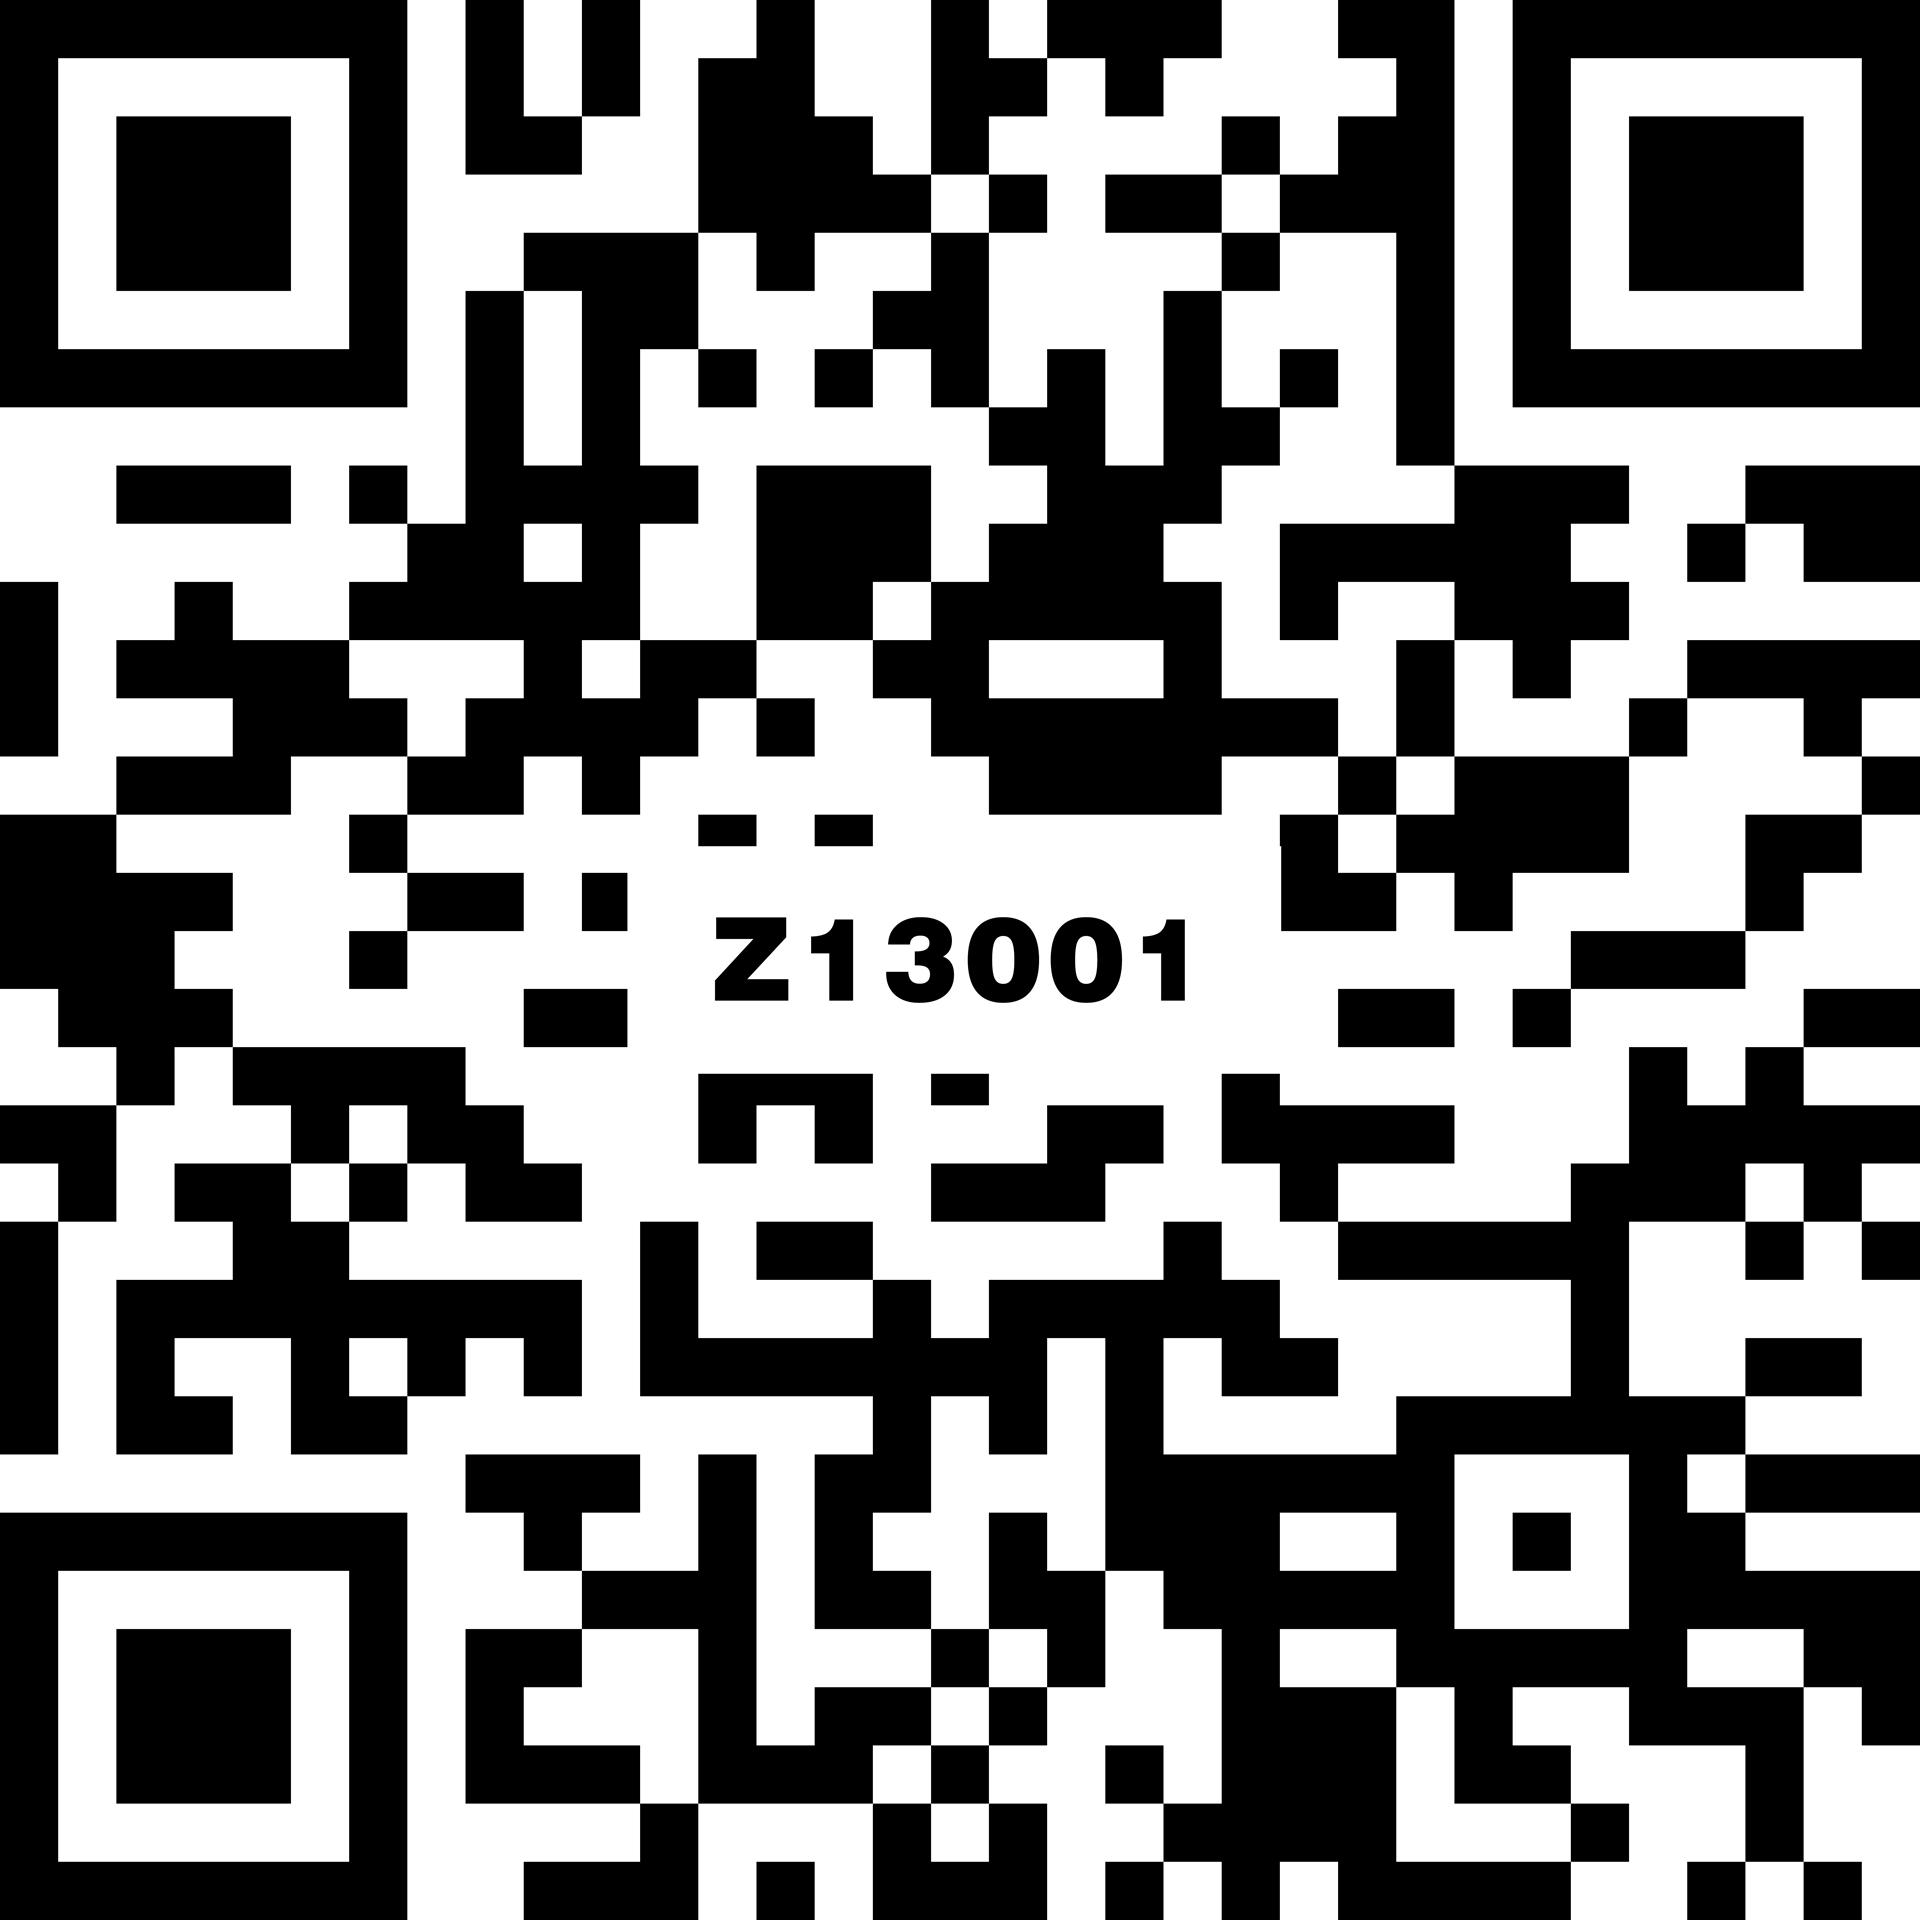 Z13001